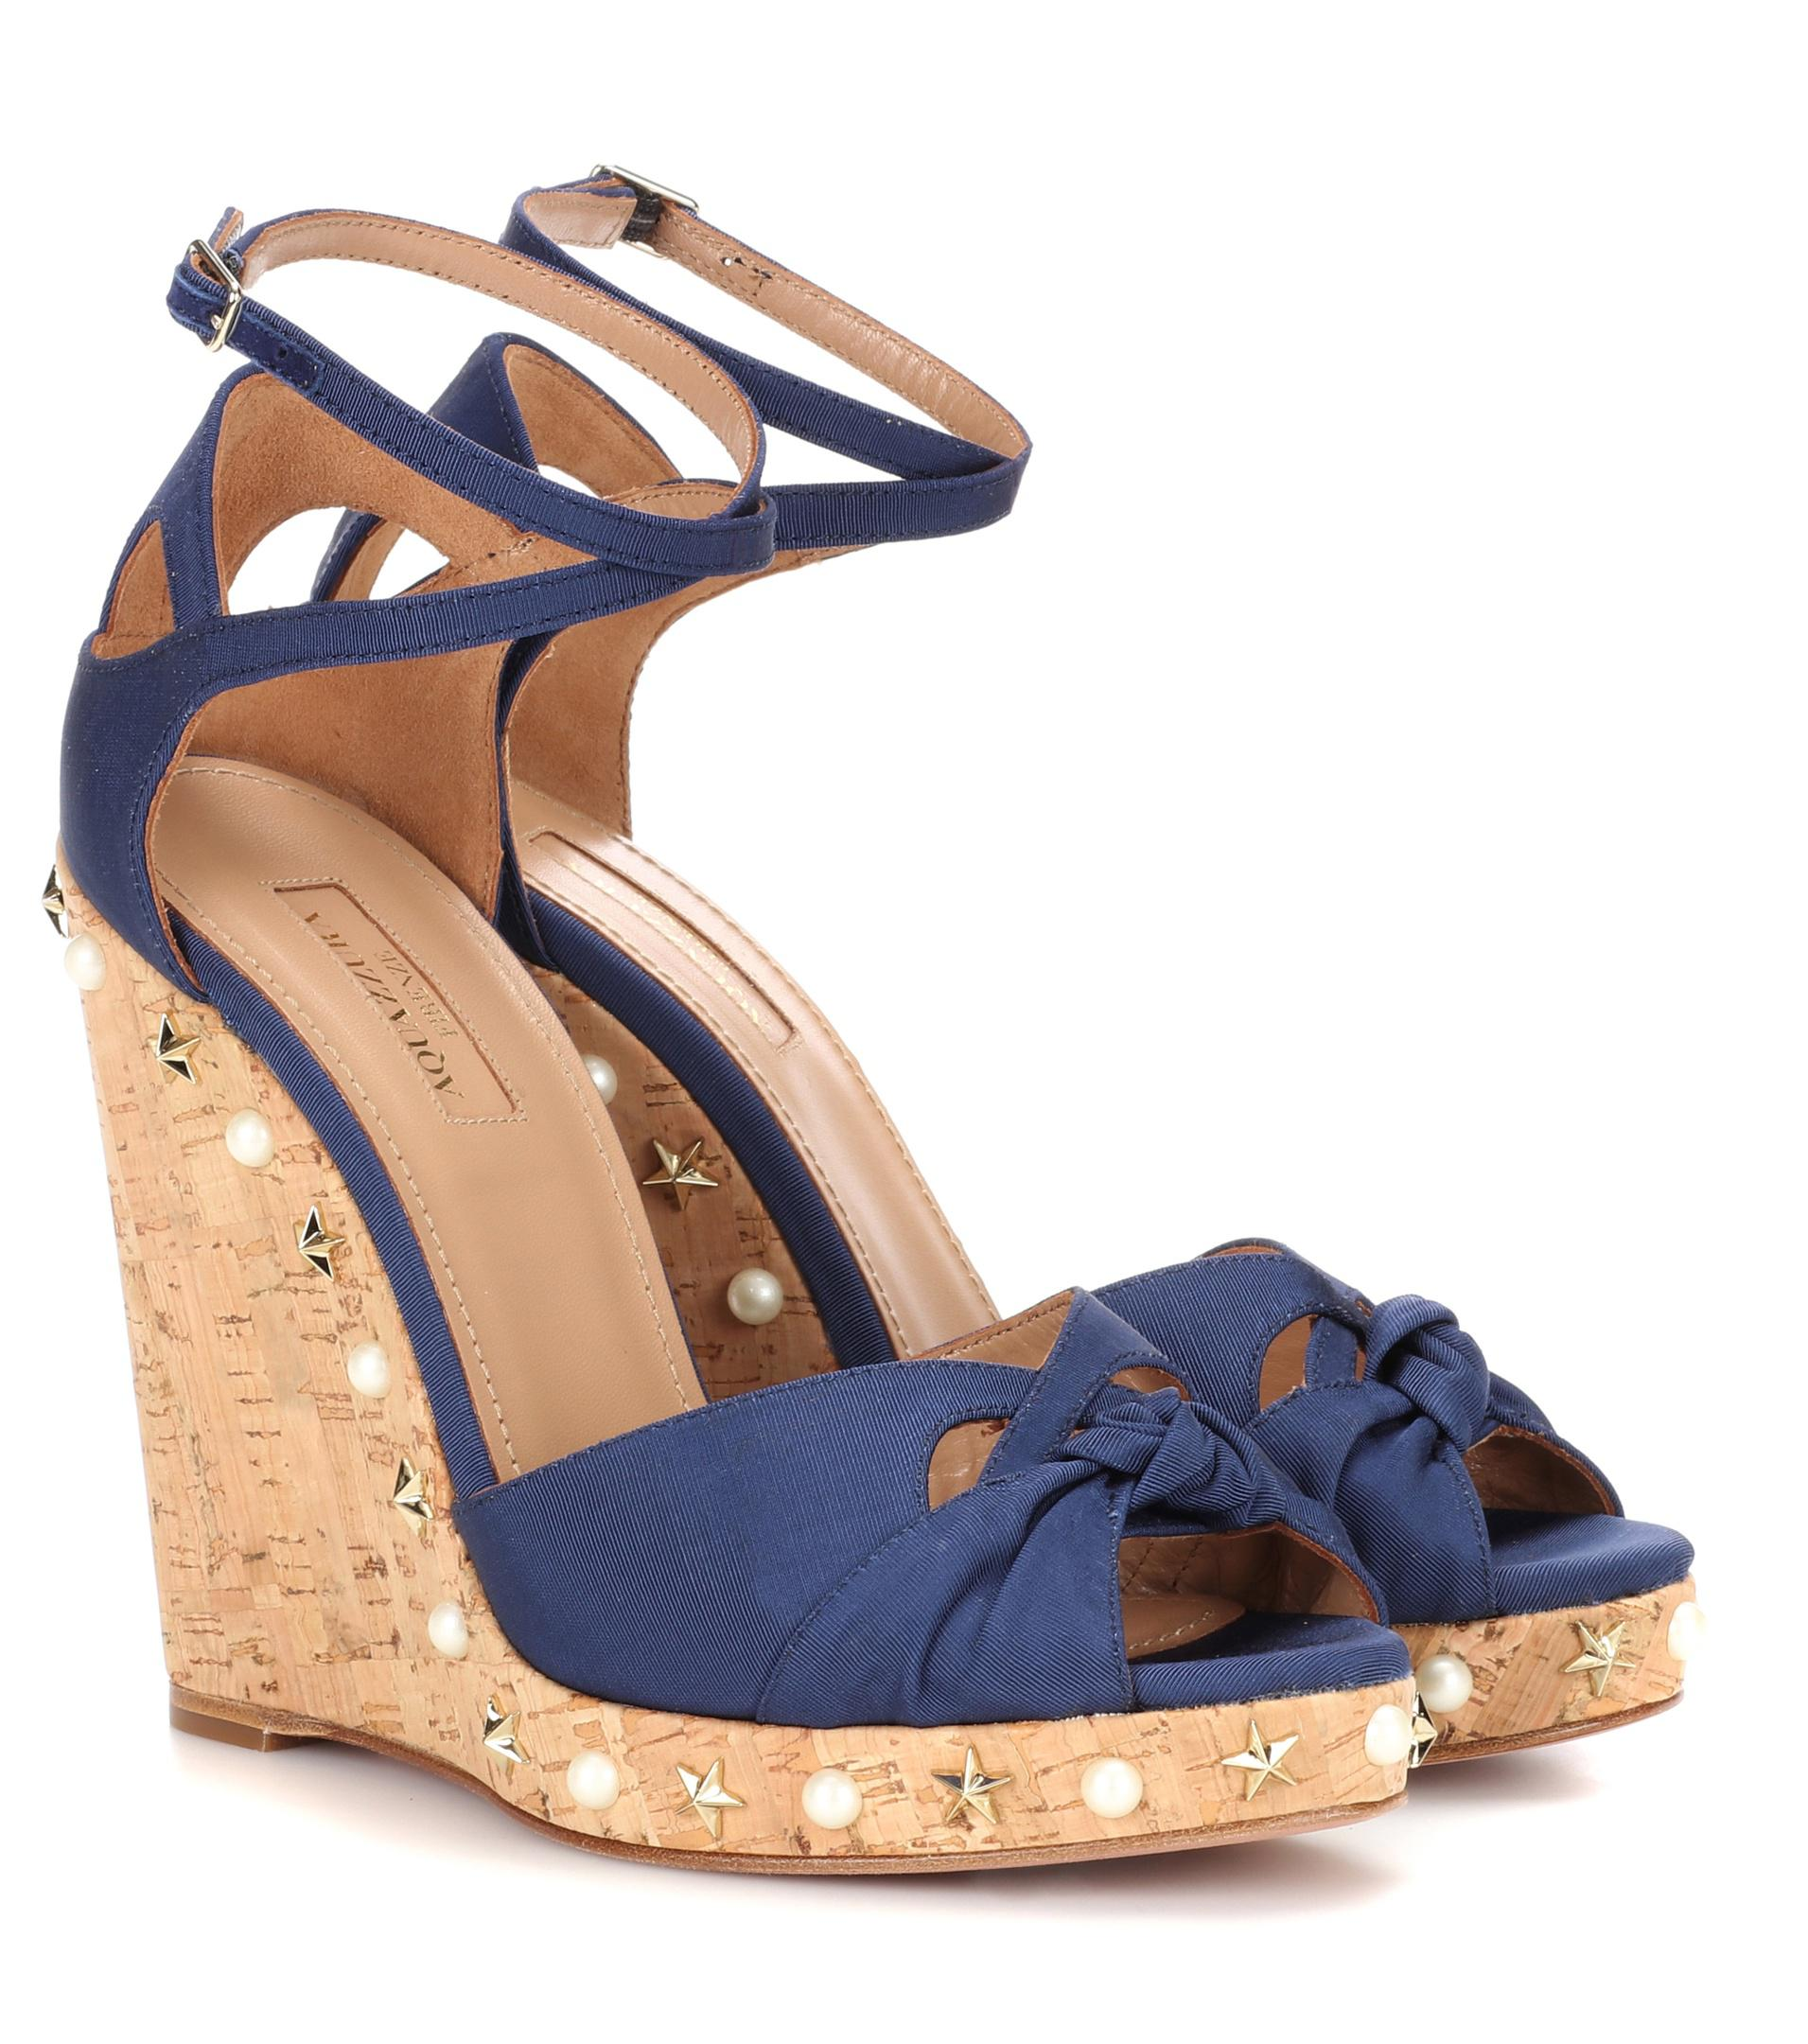 Aquazzura Harlow Wedge 115 wedge sandals high quality sale online clearance 100% original D56Z3